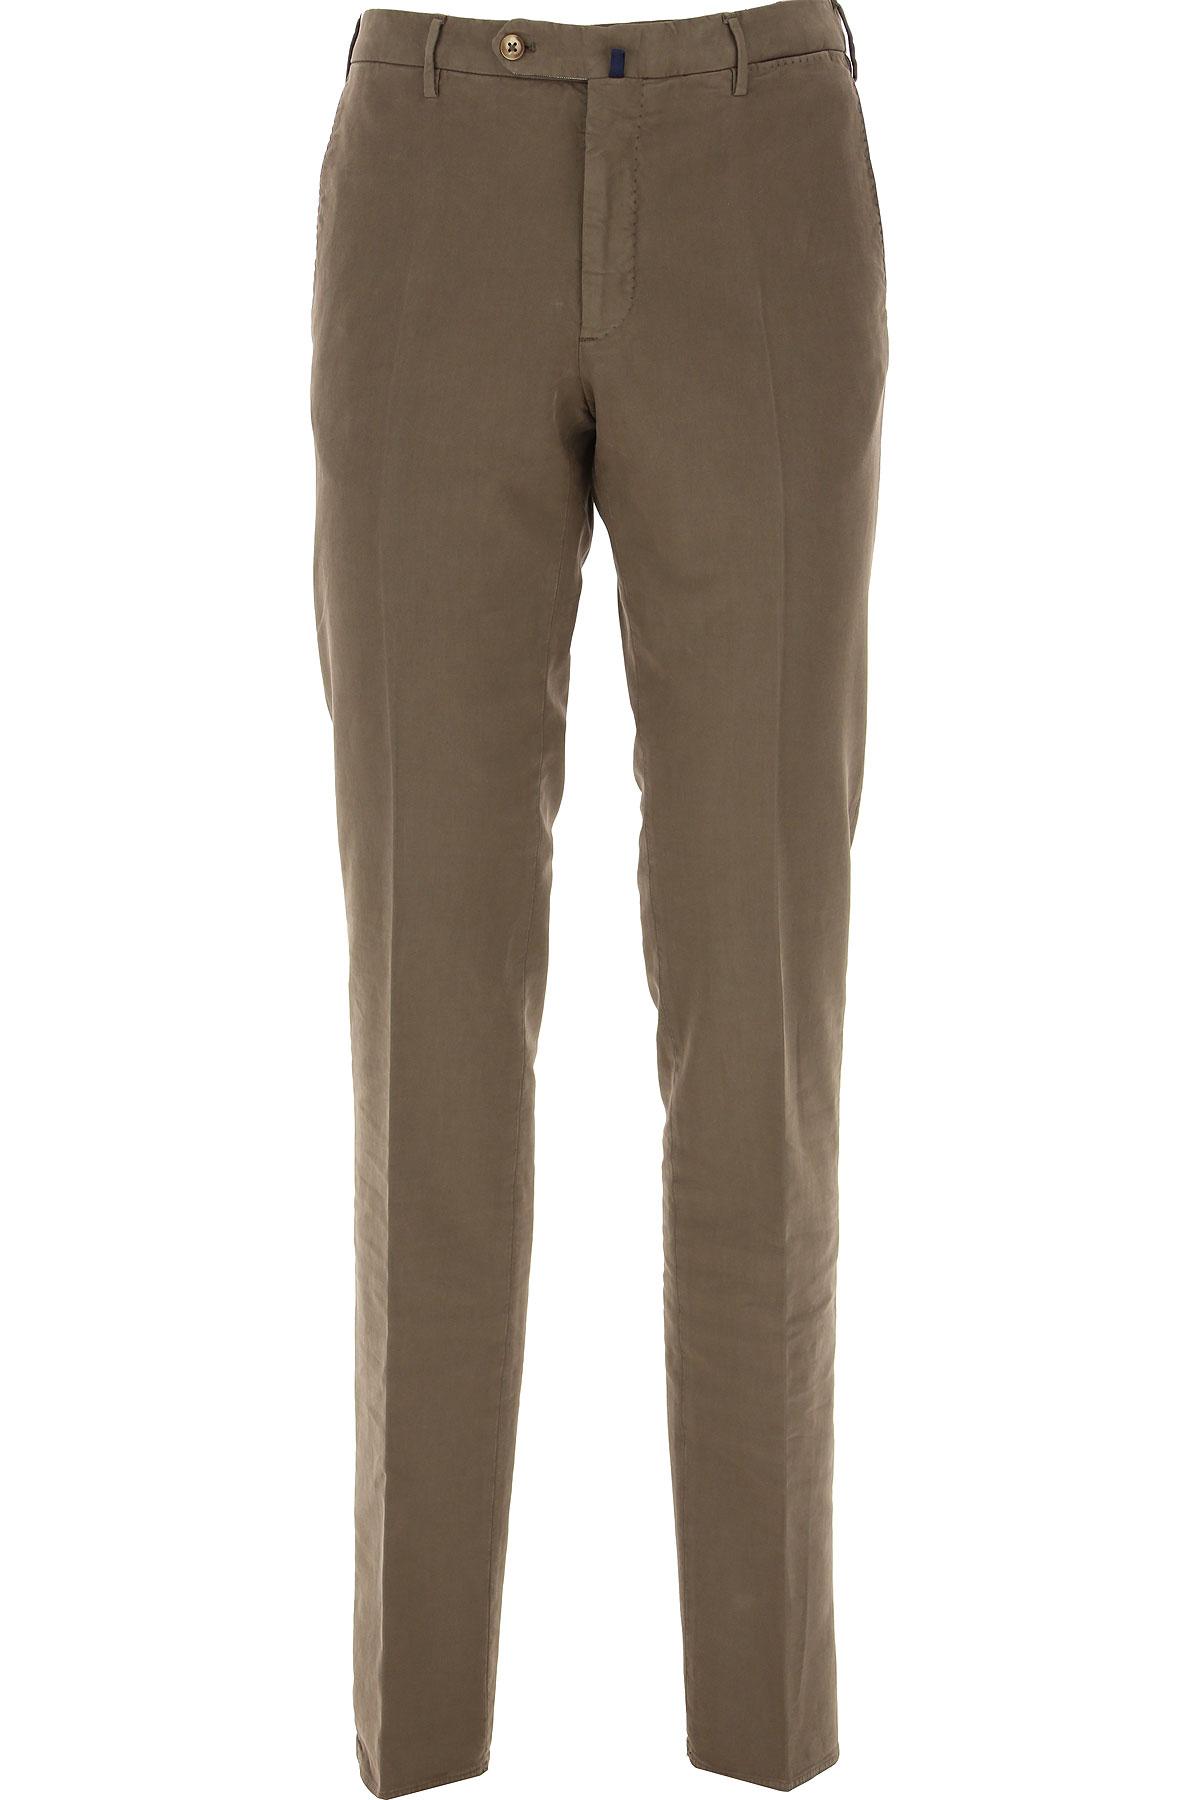 Incotex Pants for Men On Sale, Mud, Cotton, 2019, 32 34 36 38 40